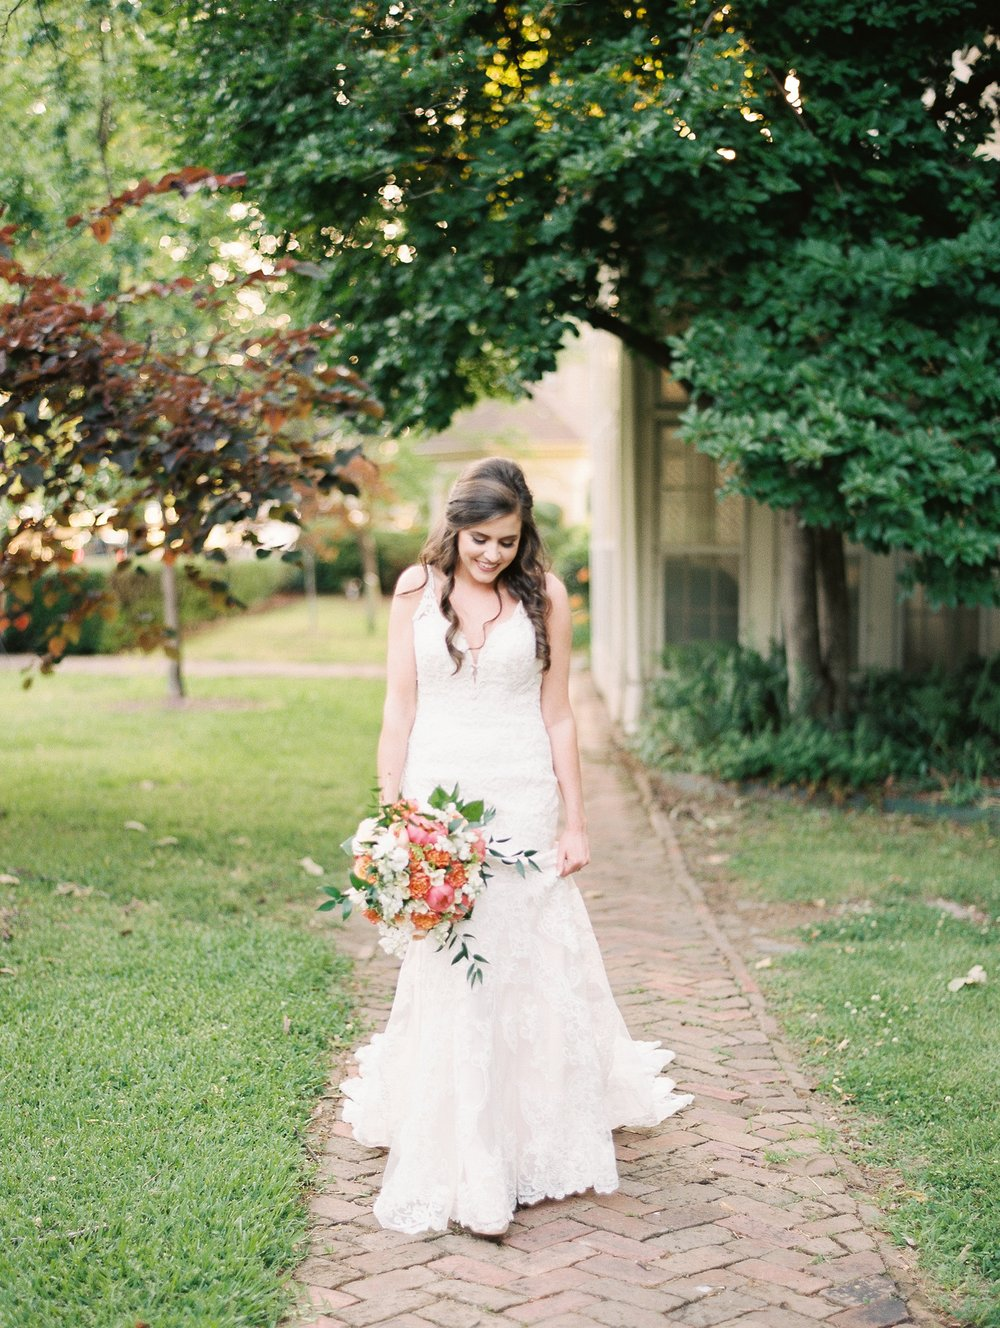 The-Terry-House-Wedding-Little-Rock-Arkansas_0071.jpg